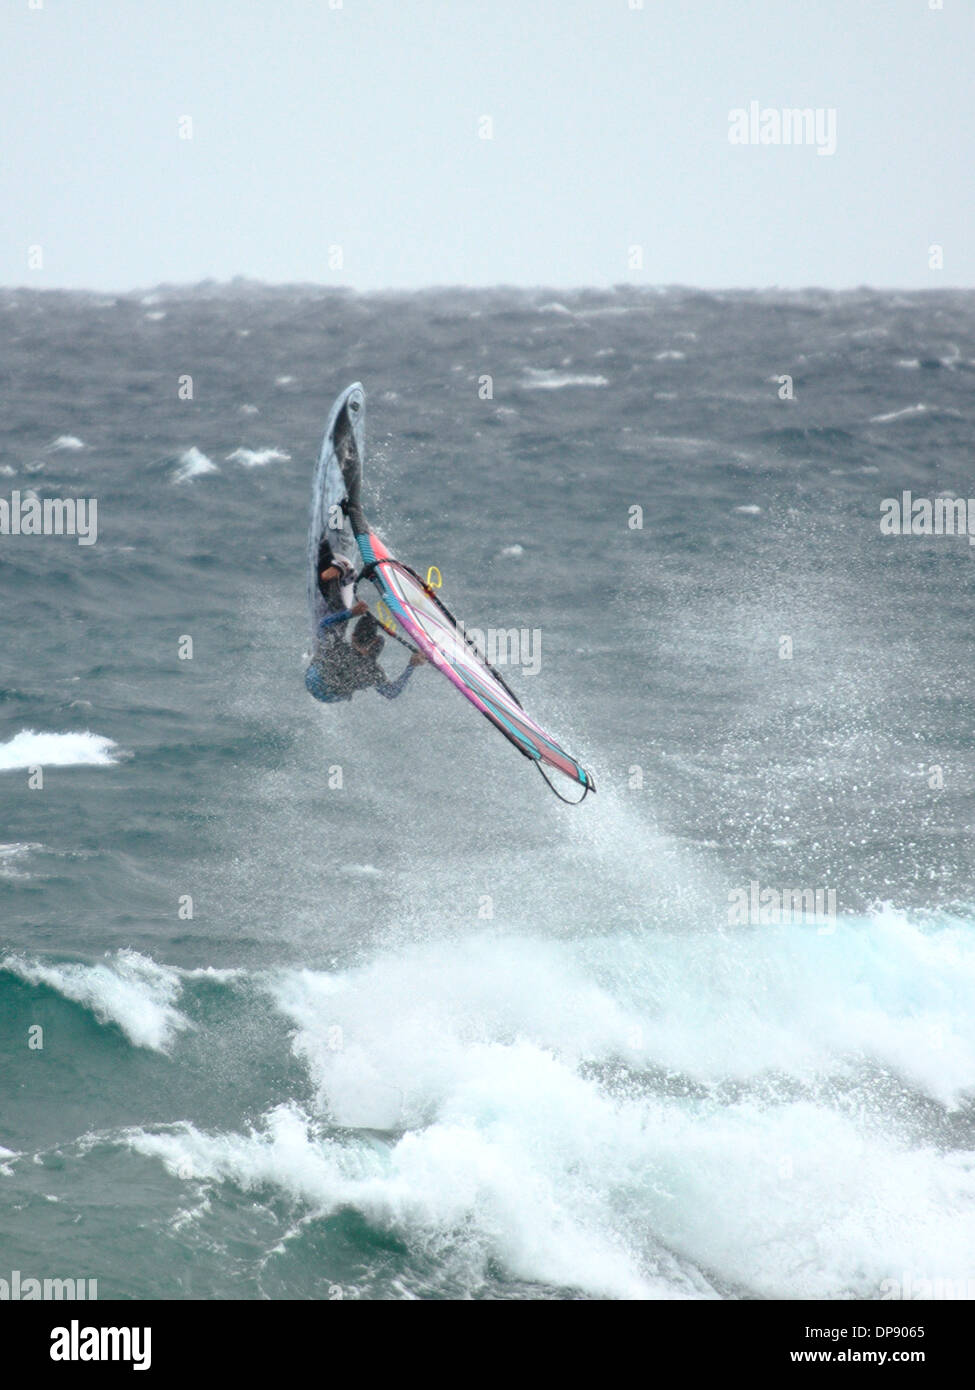 Spanish windsurfer Omar Sanchez, performing an aerial manoeuvre. - Stock Image